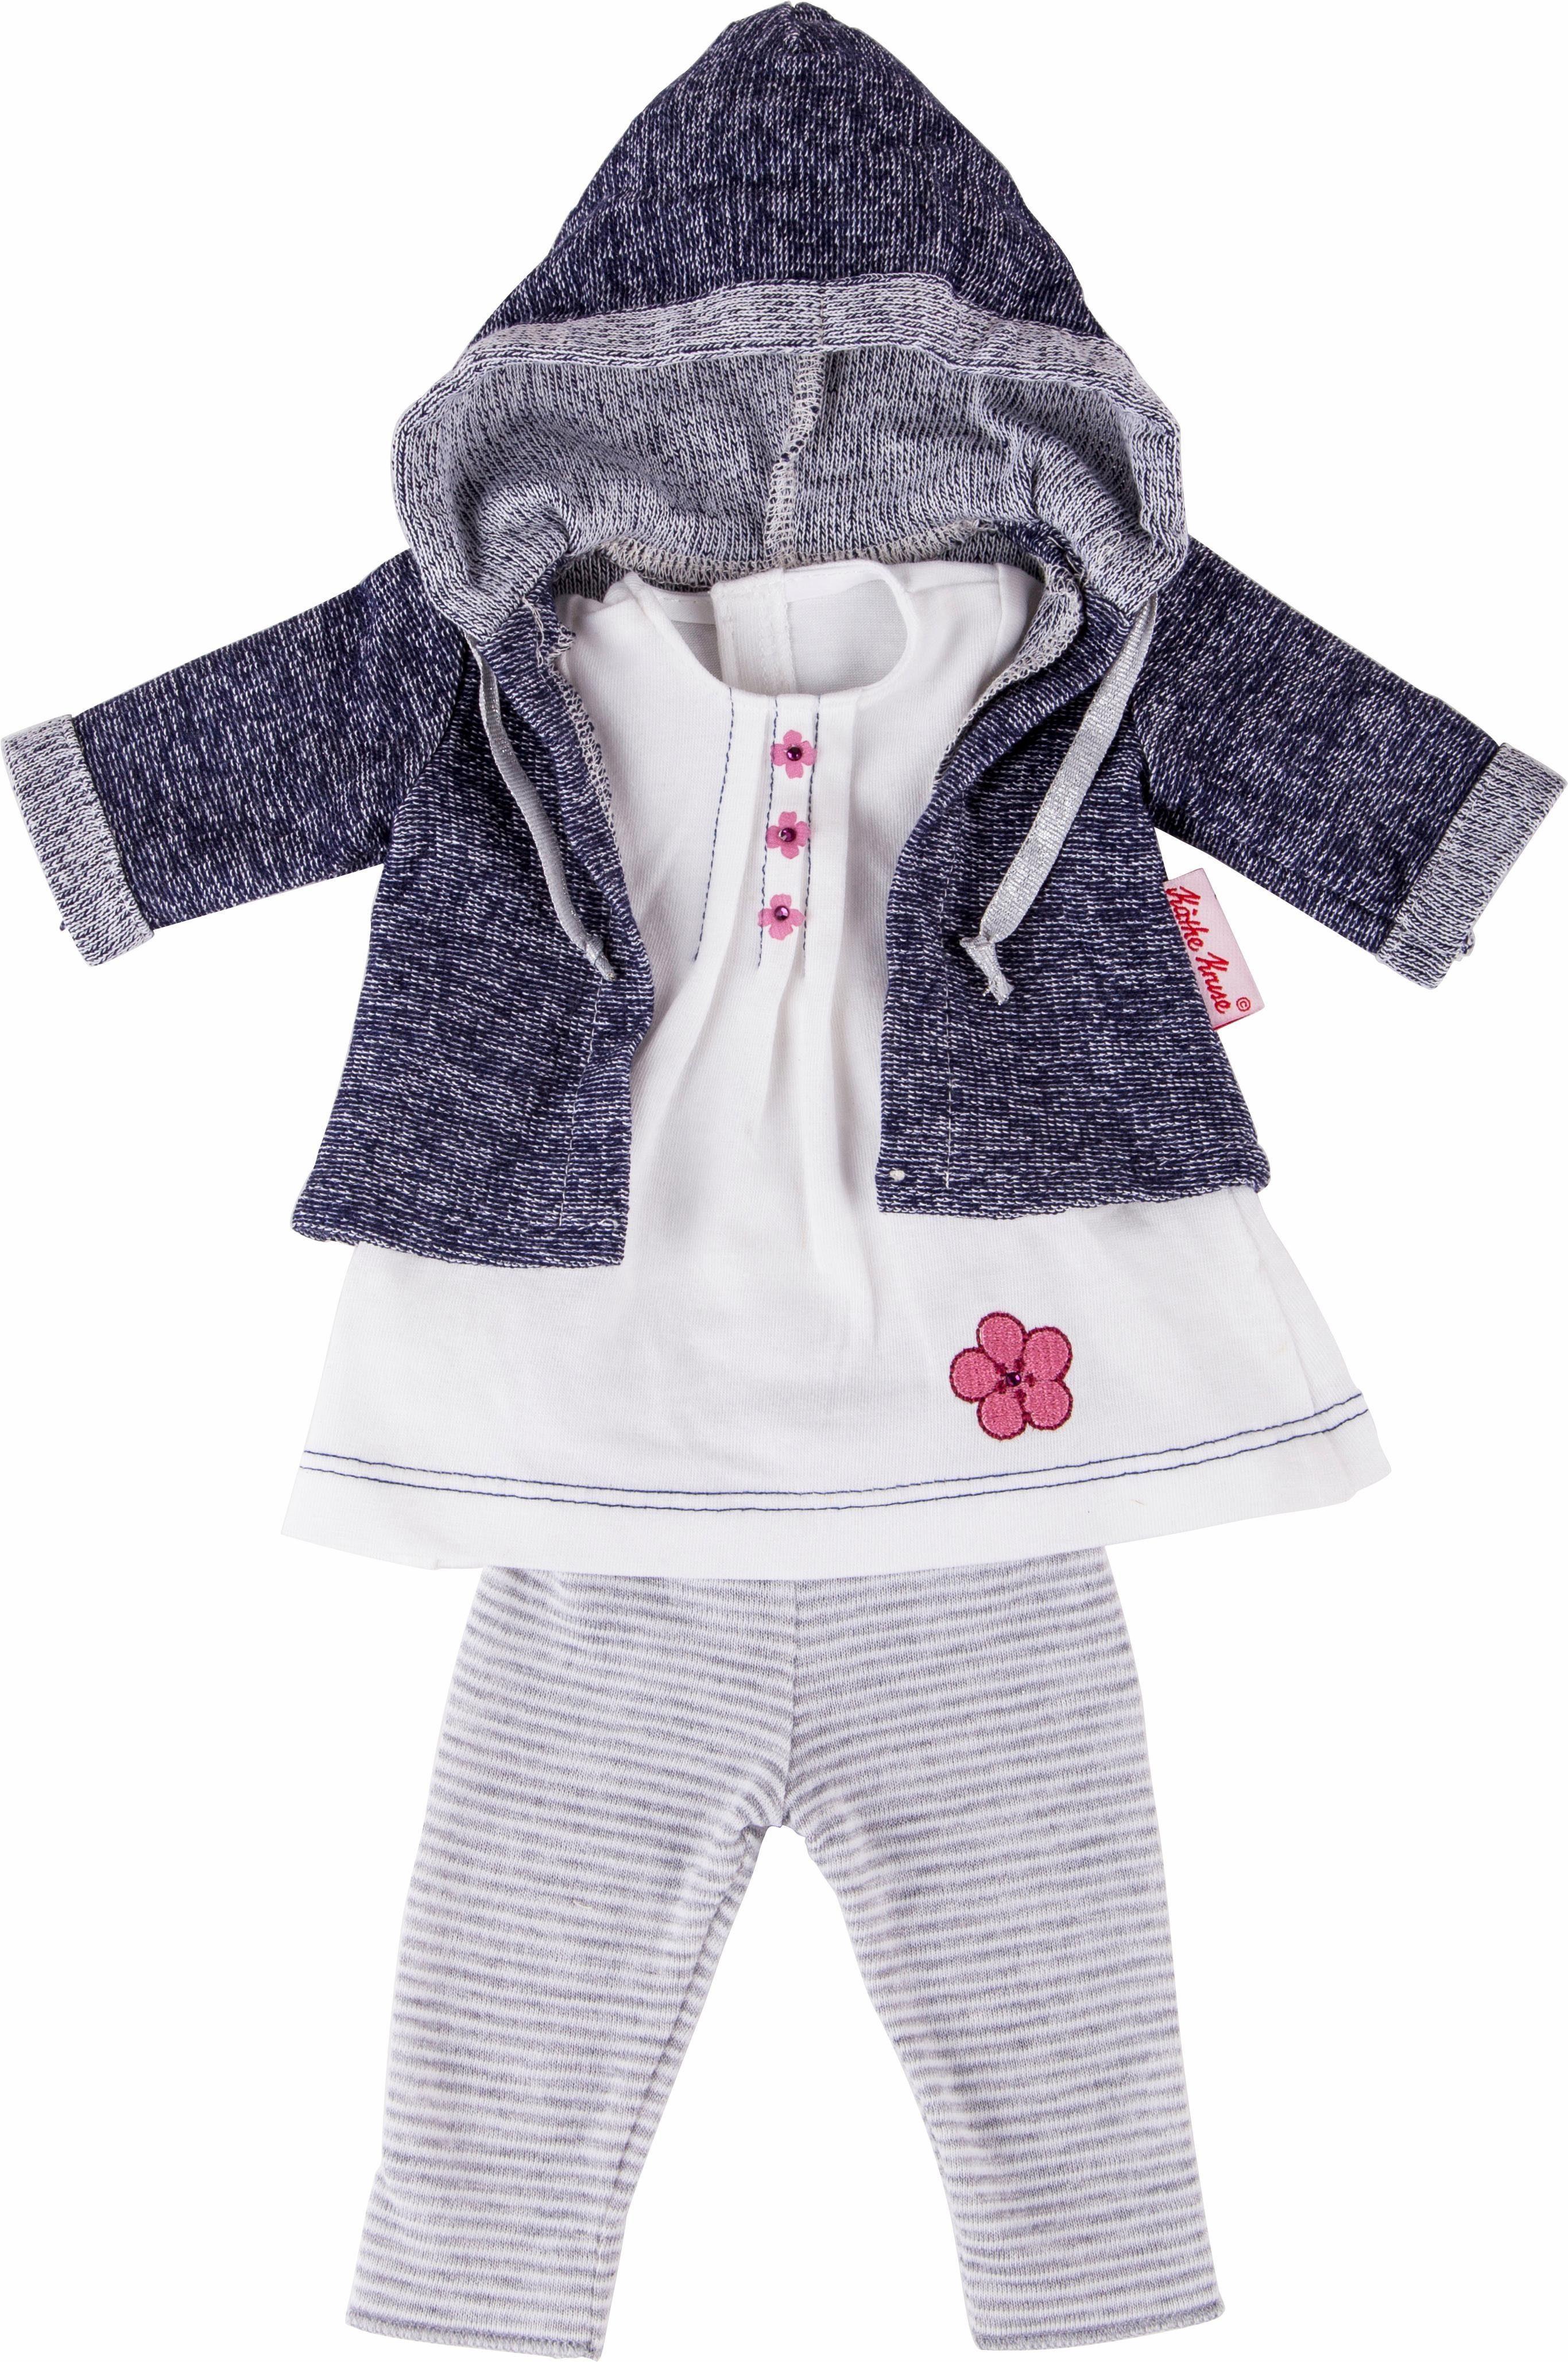 Käthe Kruse Puppenbekleidung, Größe ca. 39-41 cm, »Hanna Outfit 3-teilig«